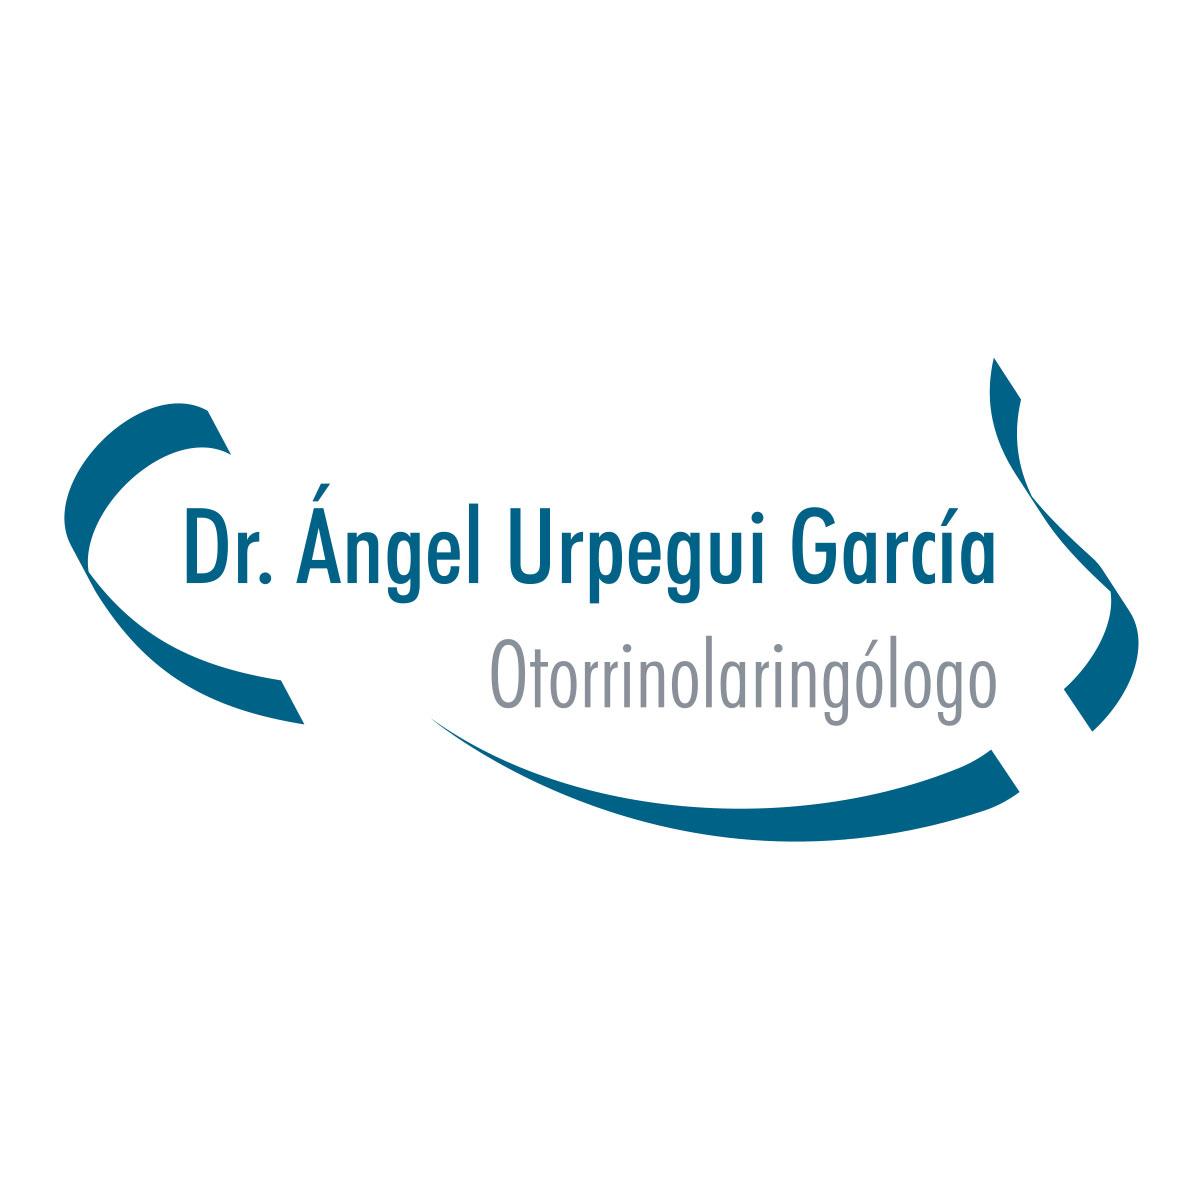 Logotipo Otorrinonaringólogo